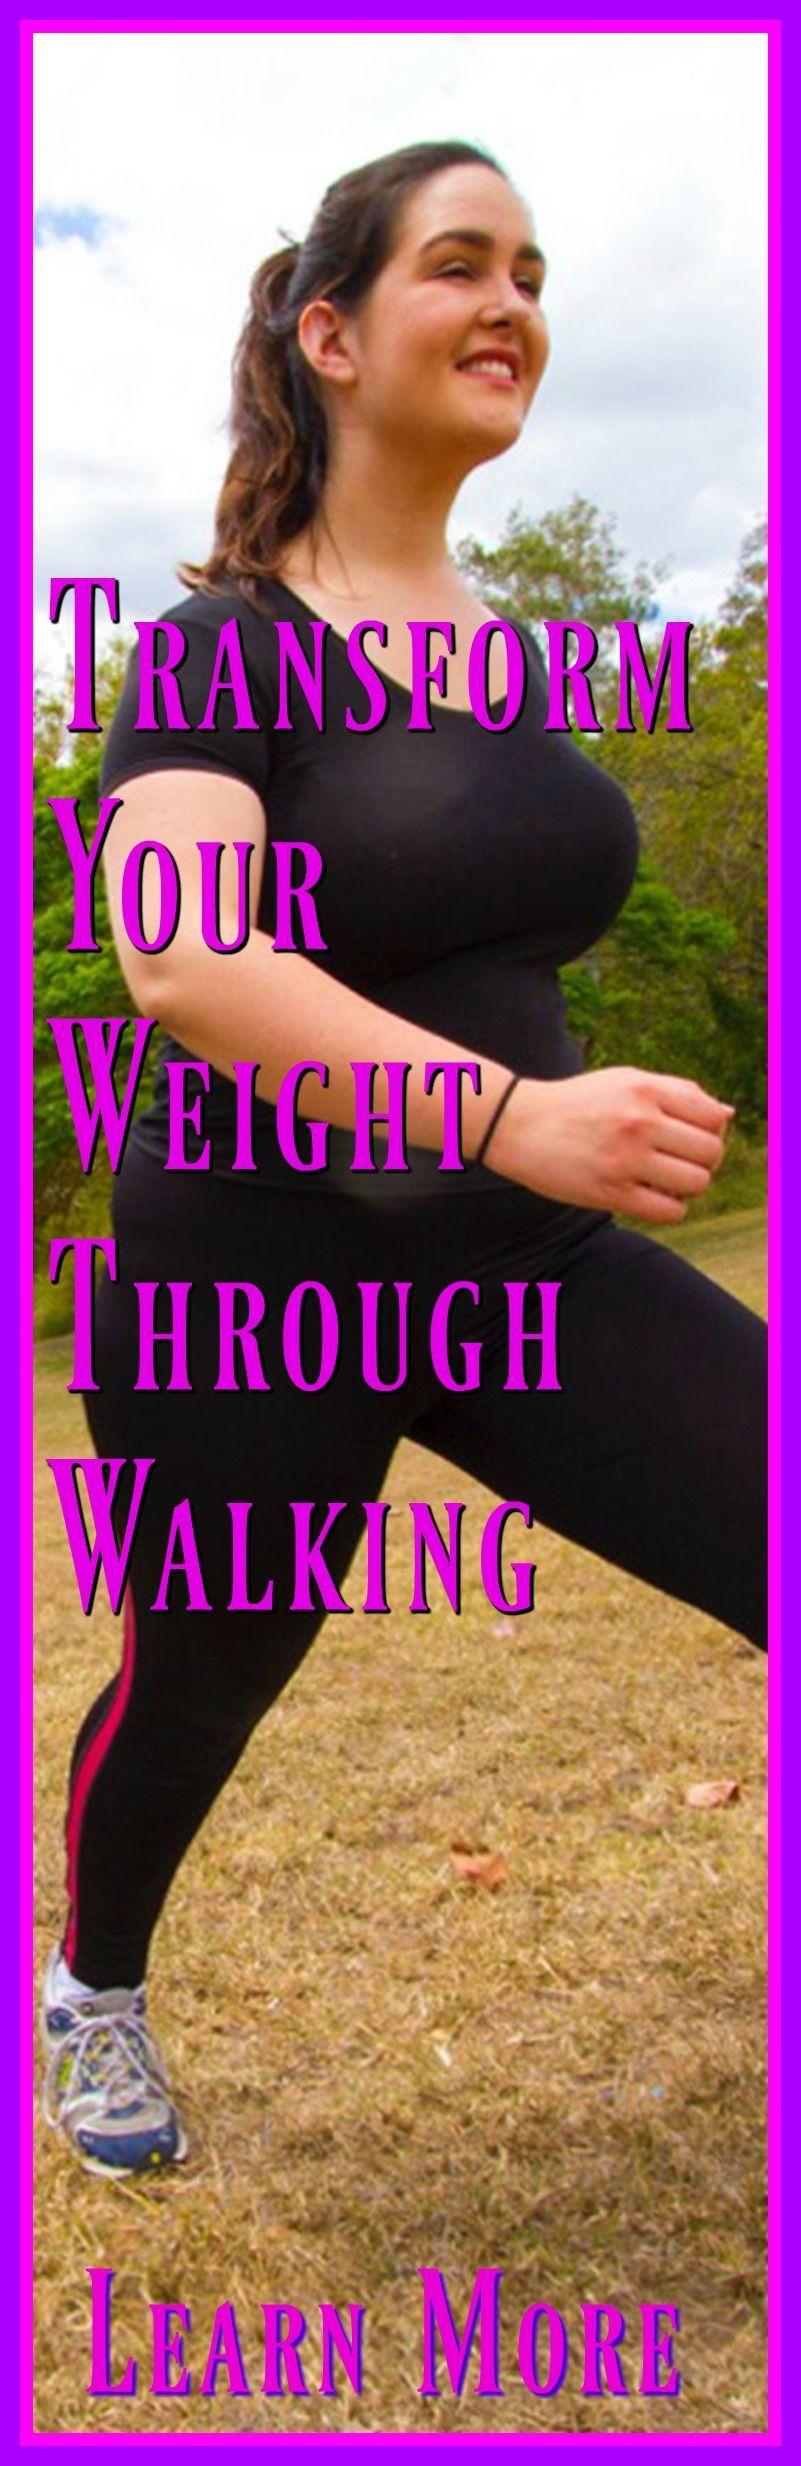 Tanisha weight loss bgc image 5